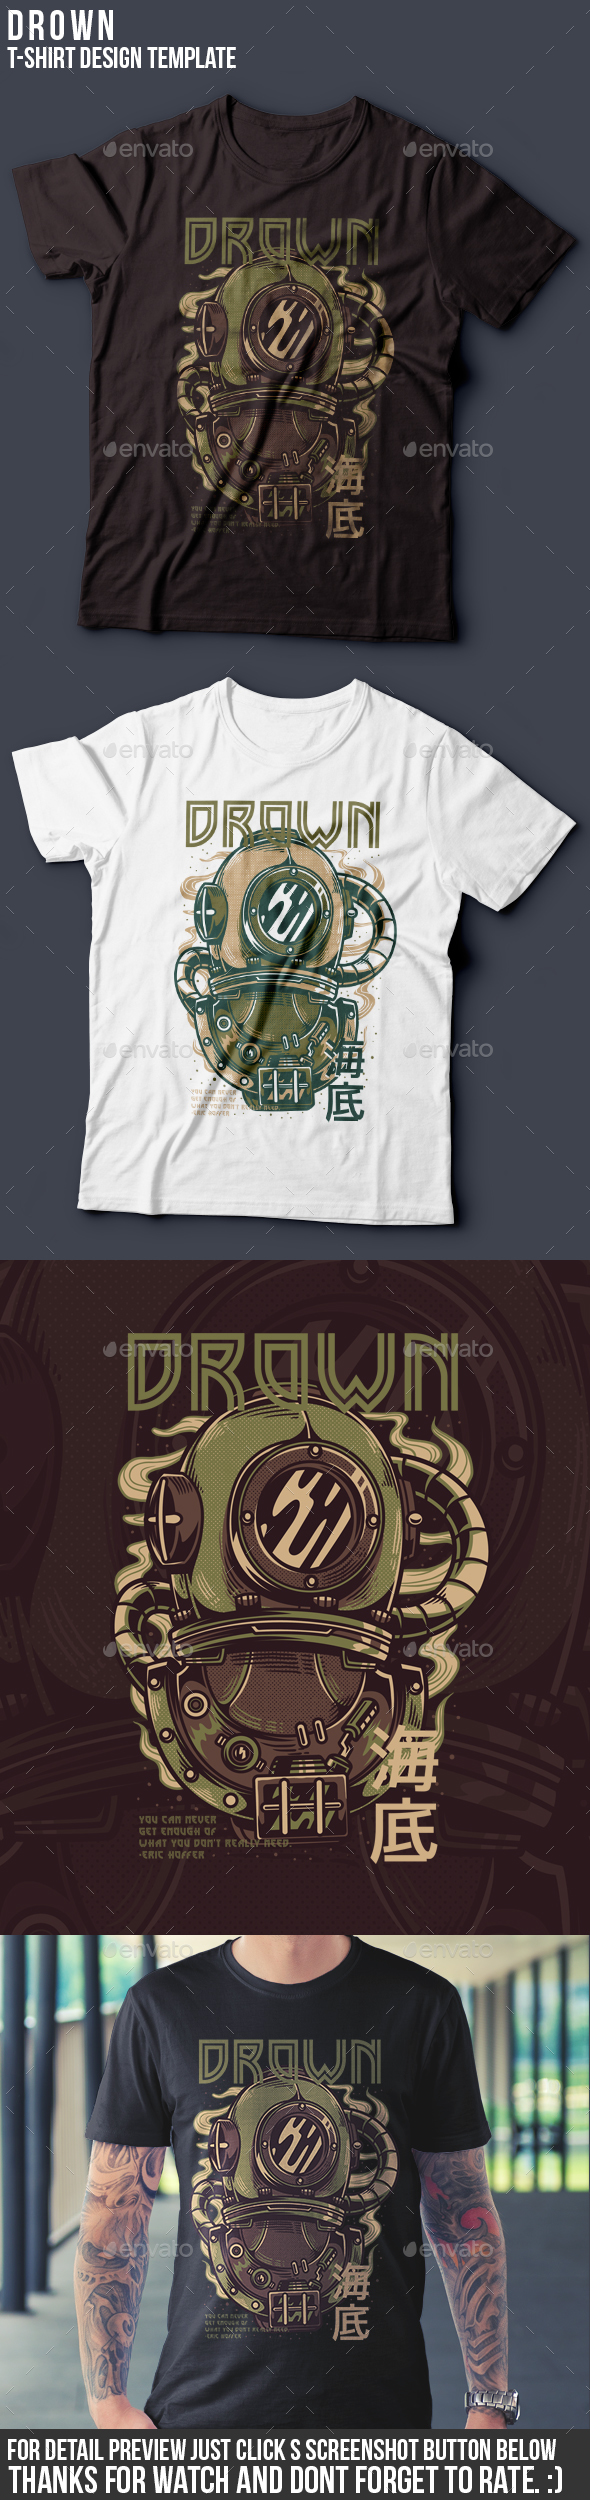 Drown T-Shirt Design